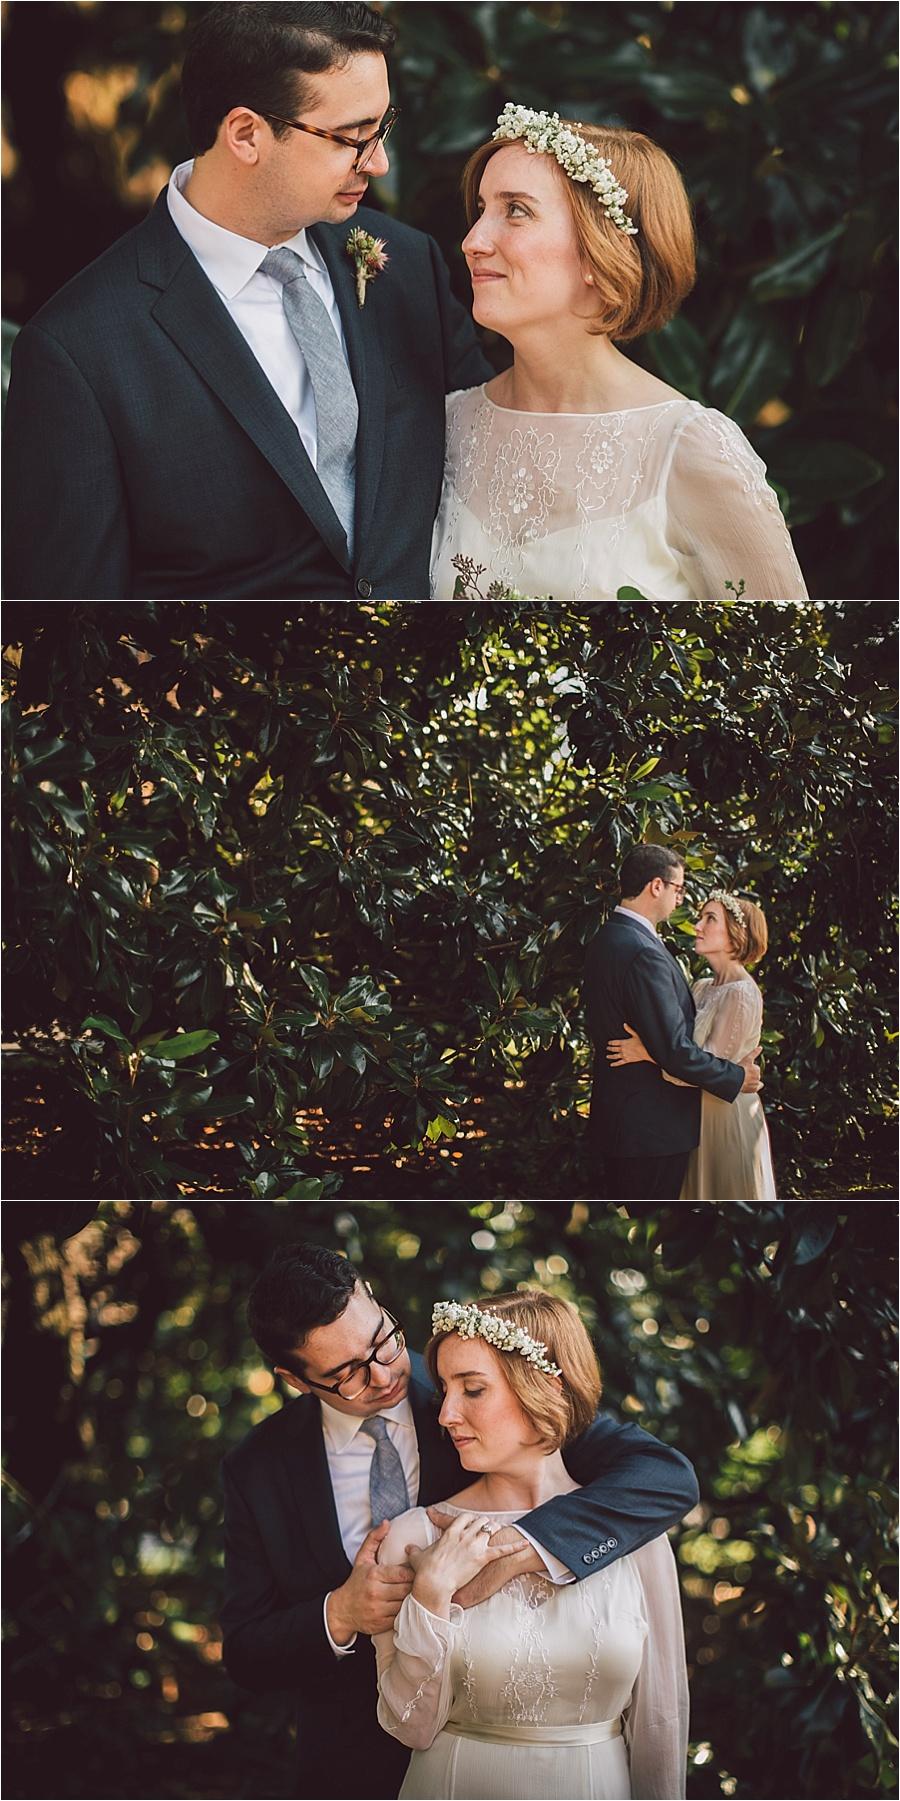 CK-Photo-Nashville-Wedding-Photographer-b_0091.jpg